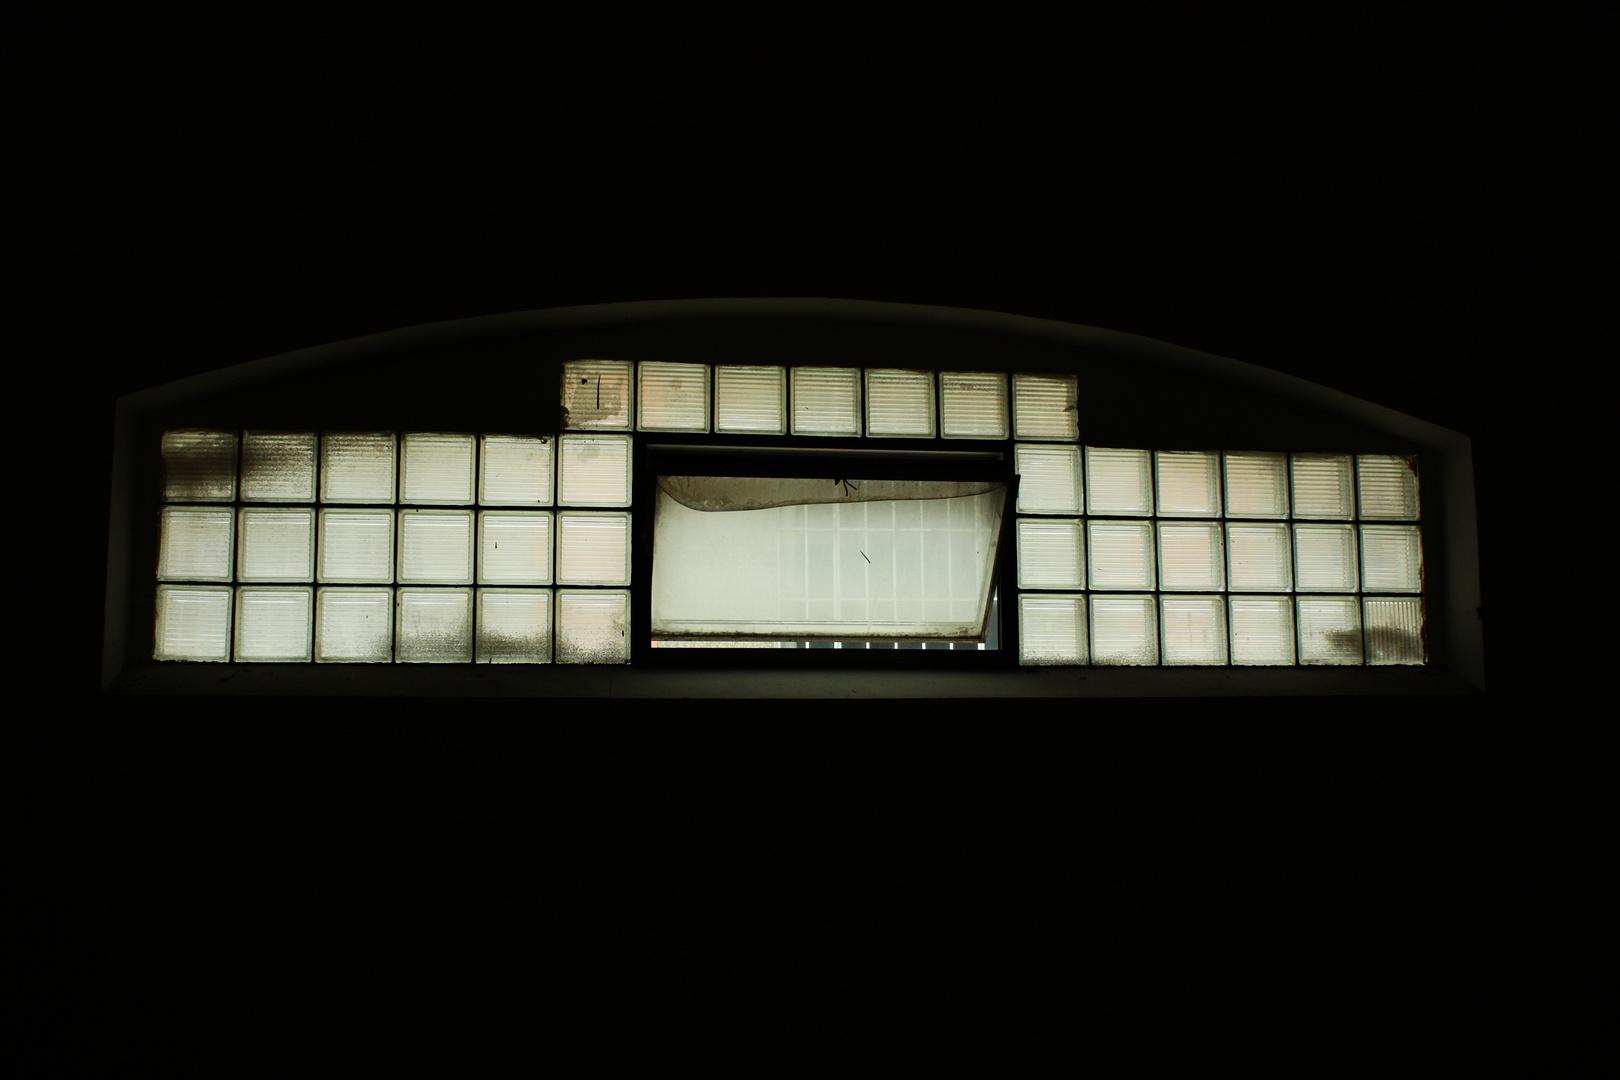 Das andere Fenster